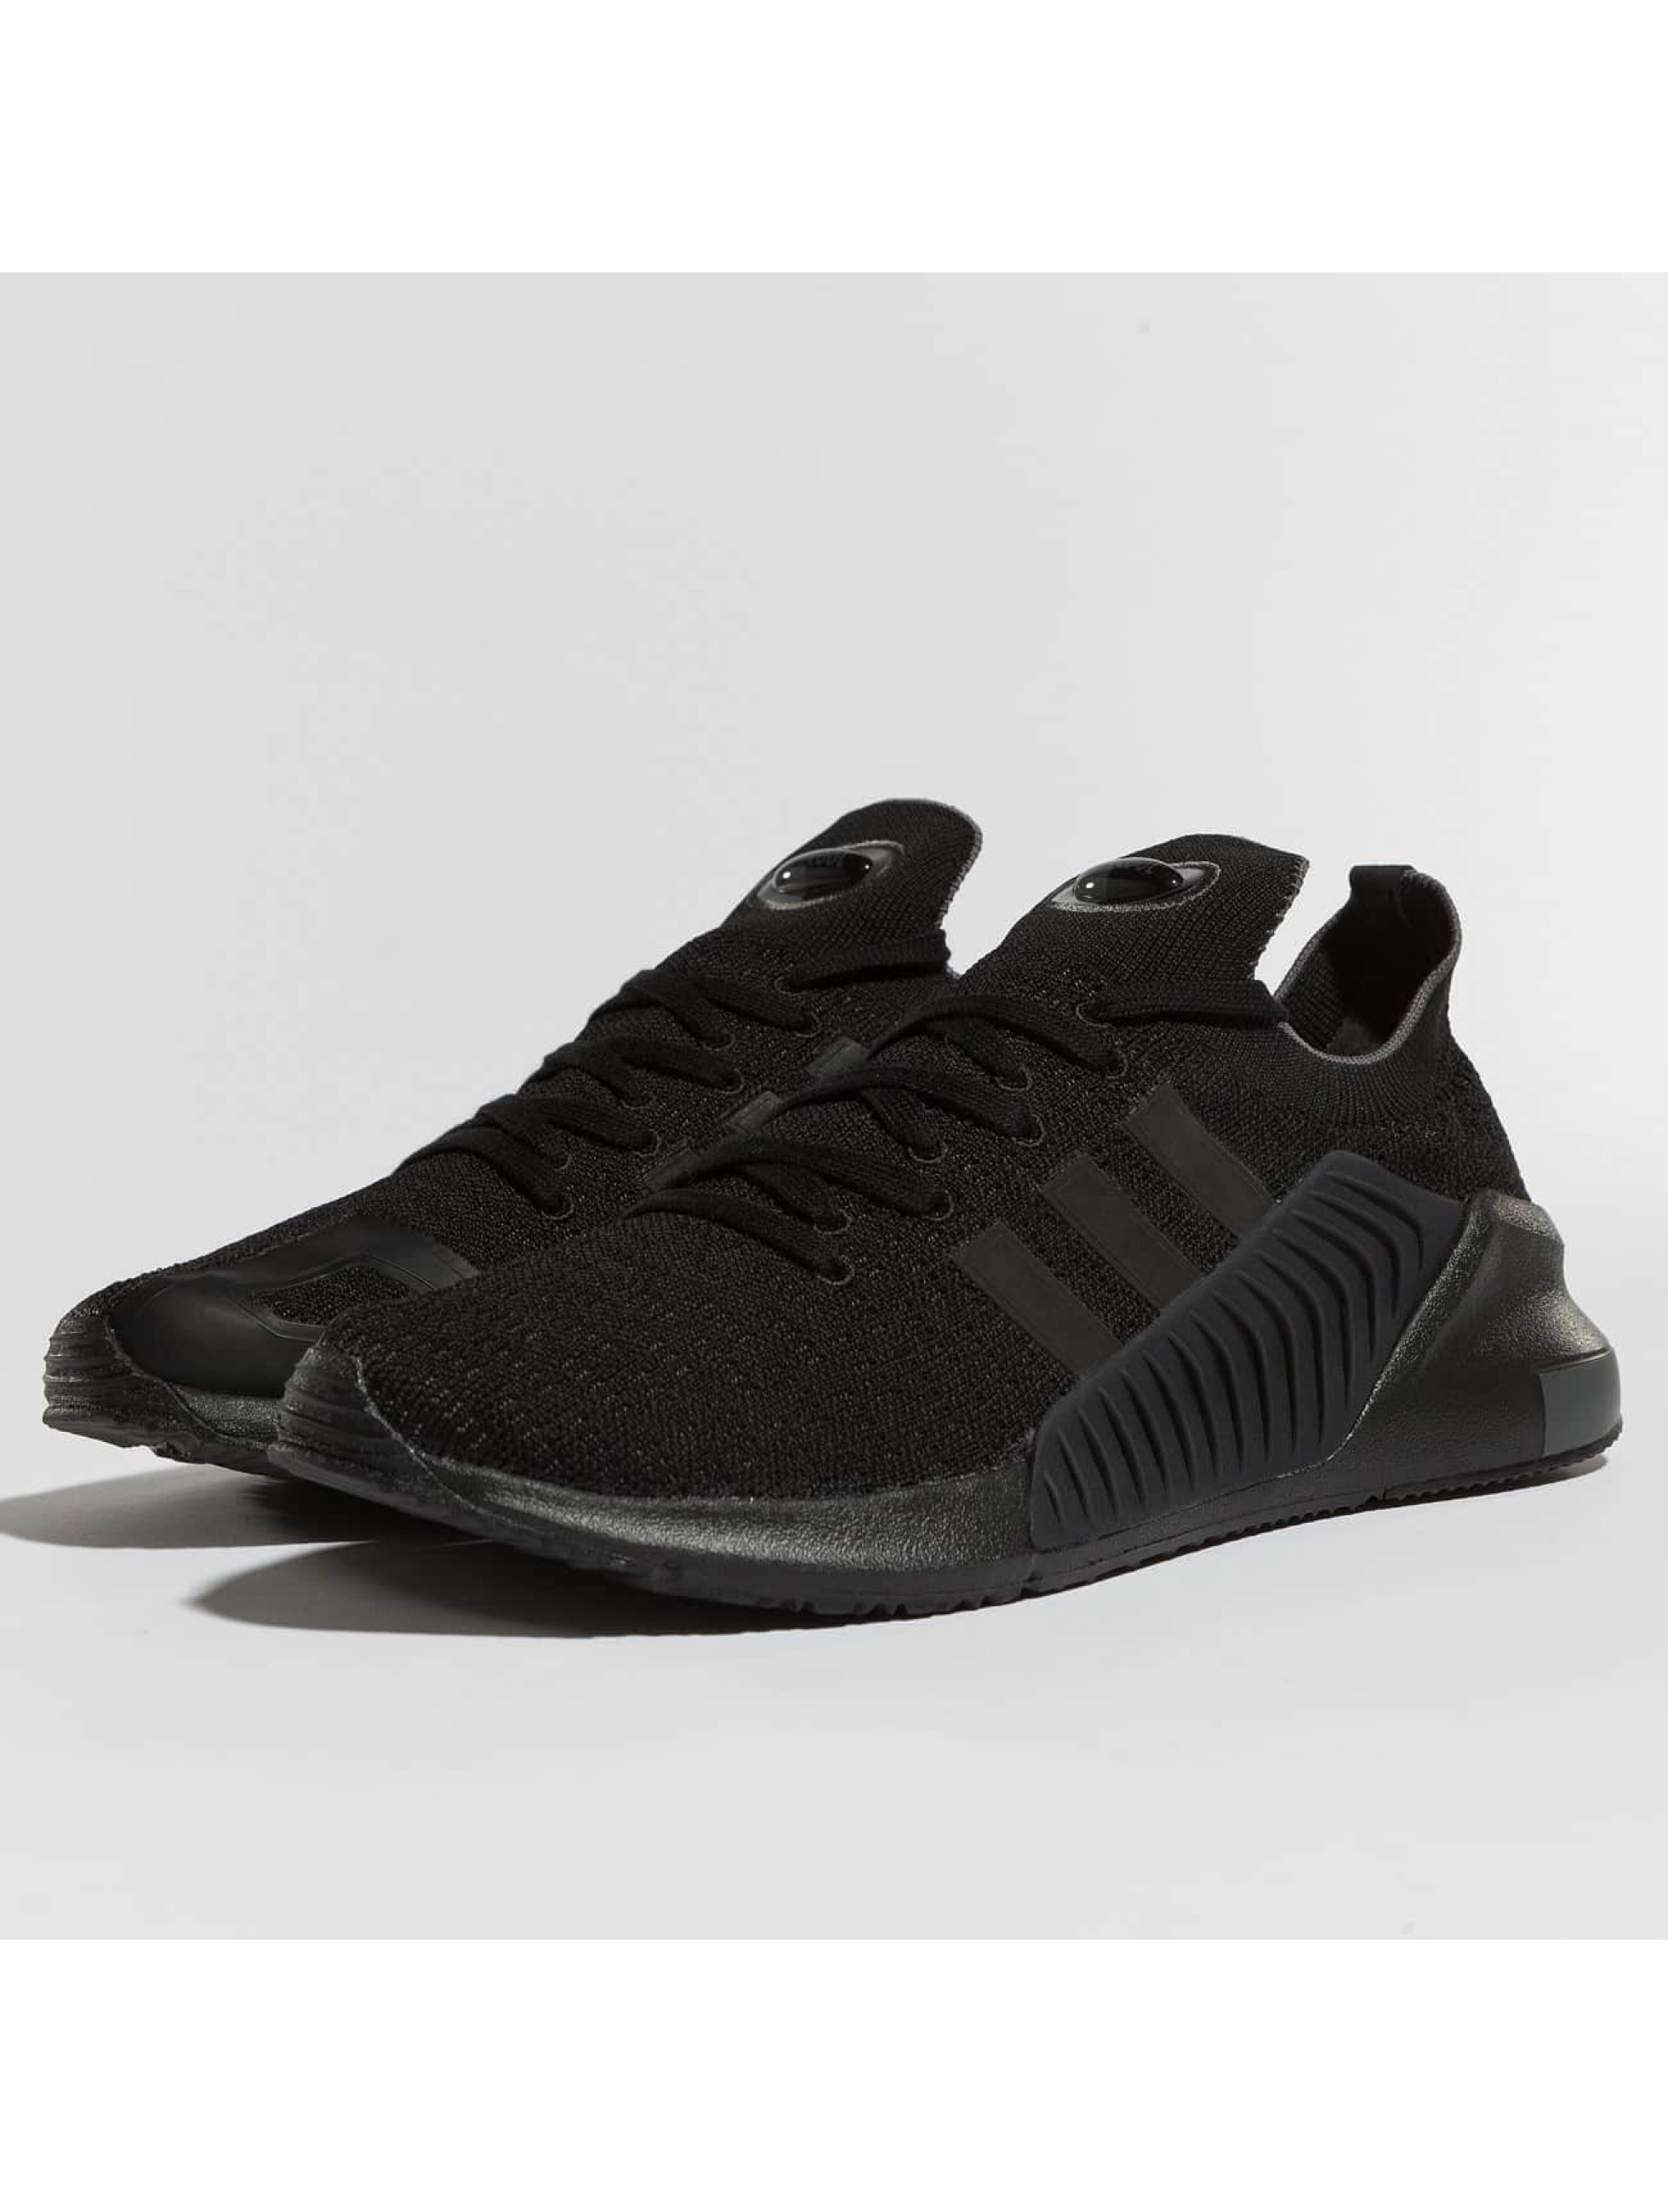 buy online 8c4dd a683a adidas originals Skor   Sneakers Climacool i svart 436965